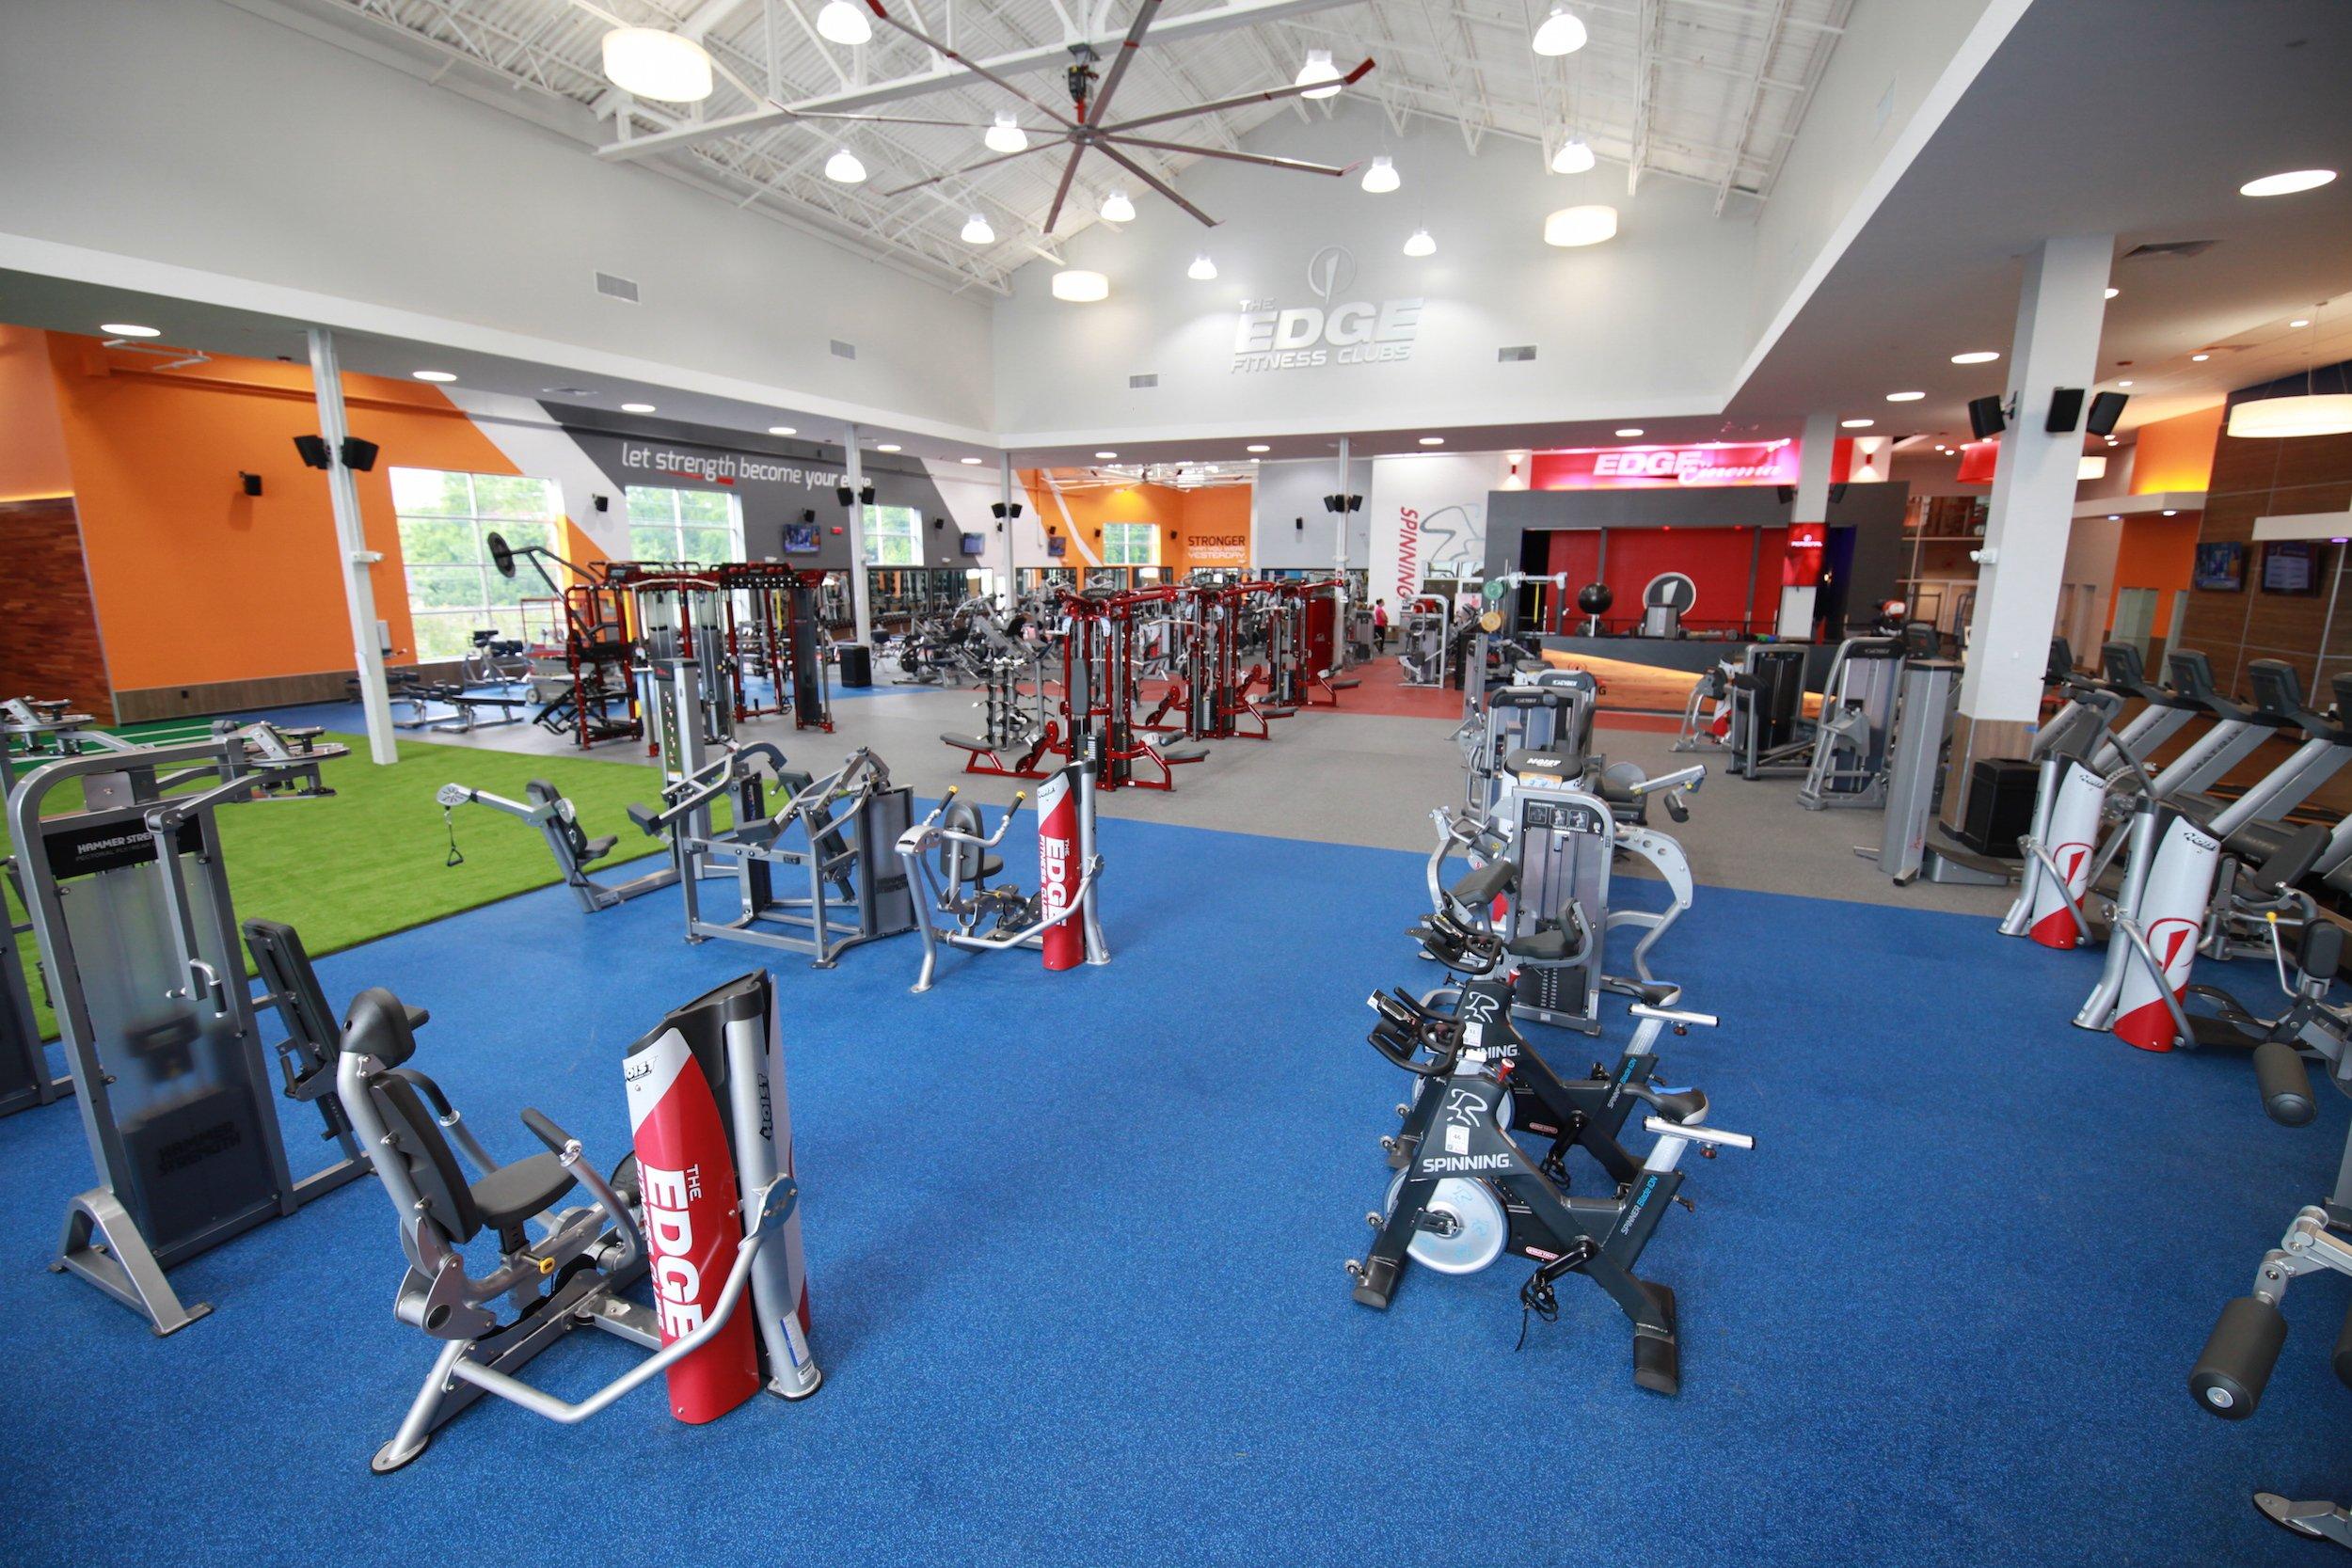 edge-workout-floor